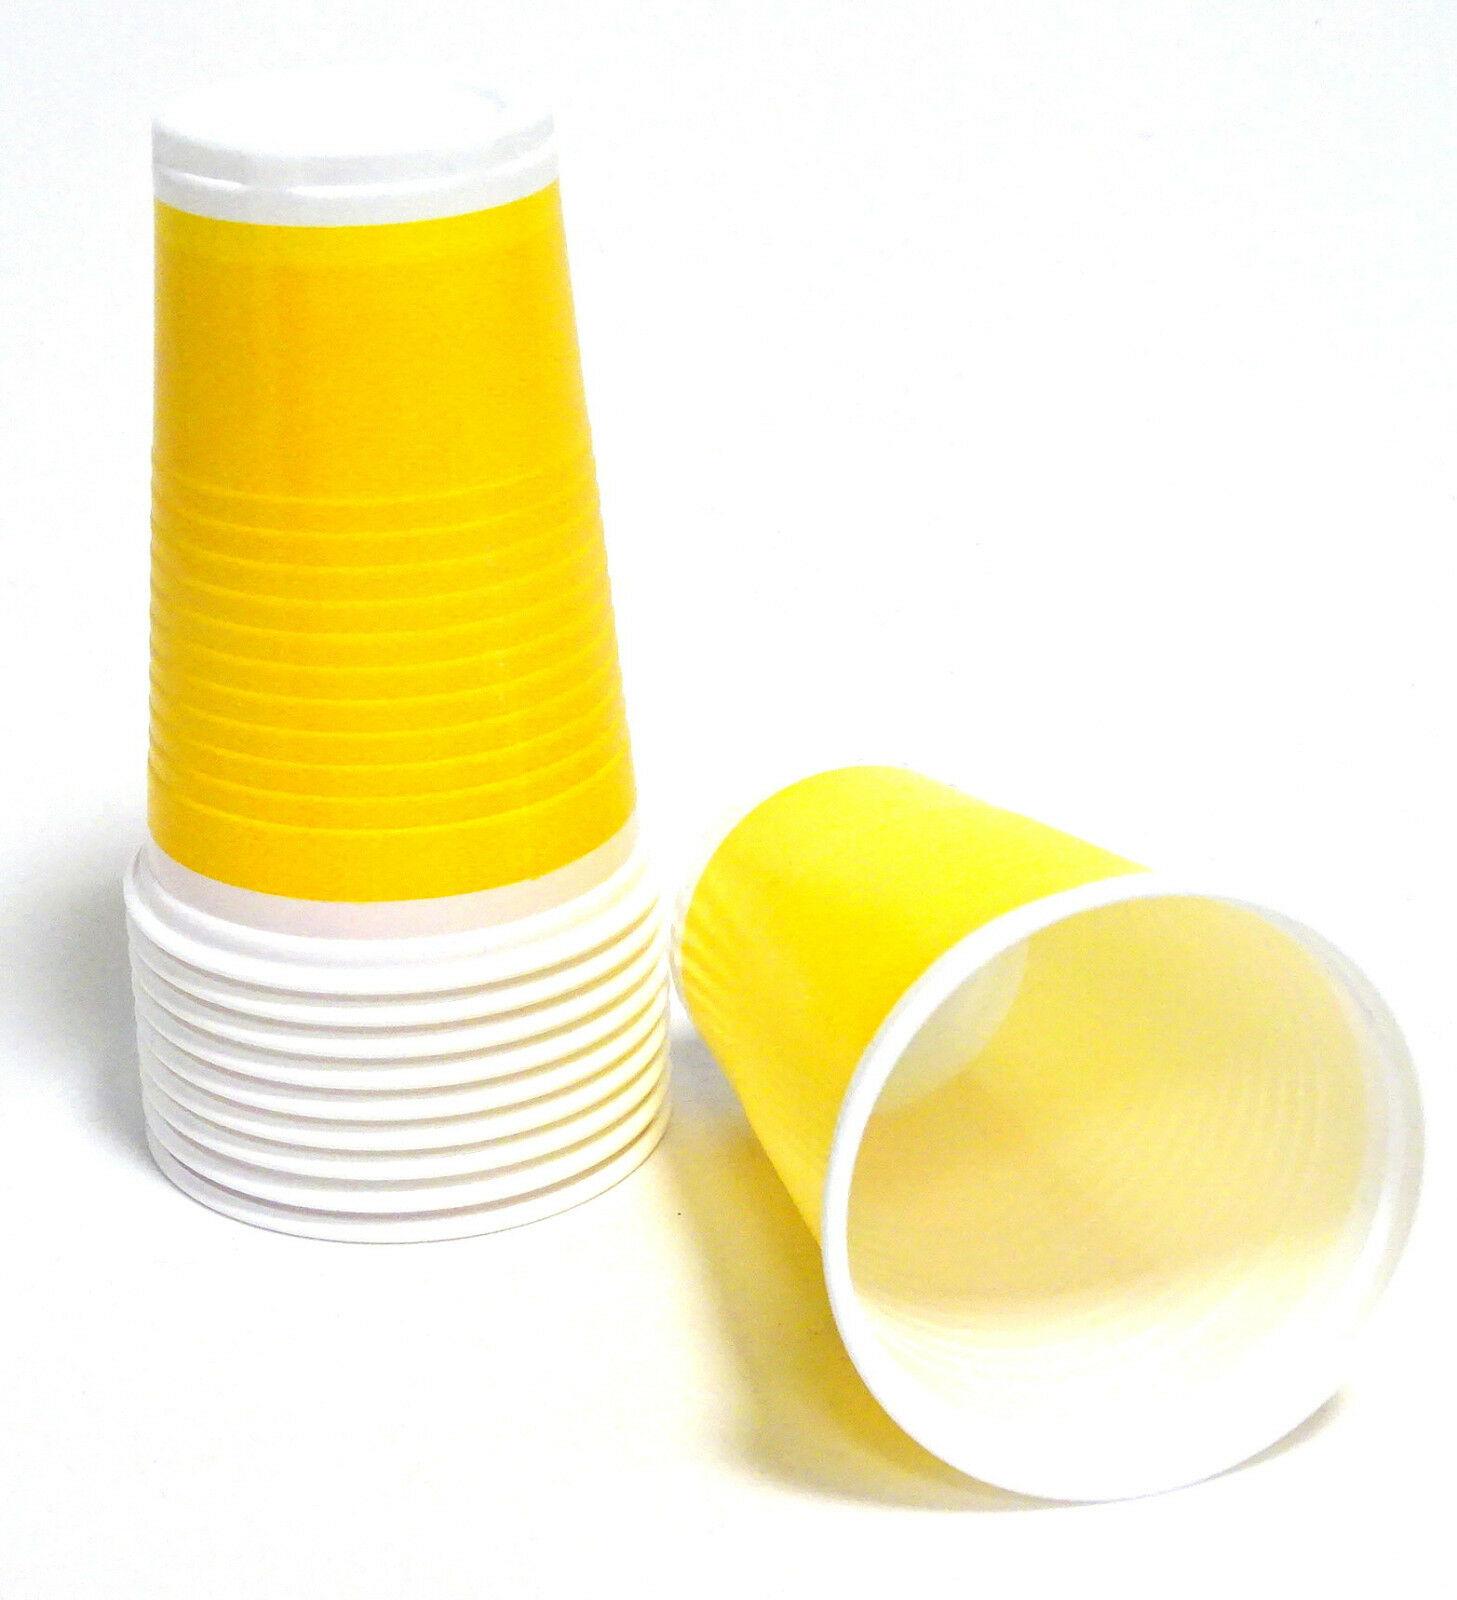 200-3.000 Plastikbecher Einwegbecher 0,2 l Trinkbecher Rot Gelb Blau ab 0,03€/St - 1.000 Stück, Gelb